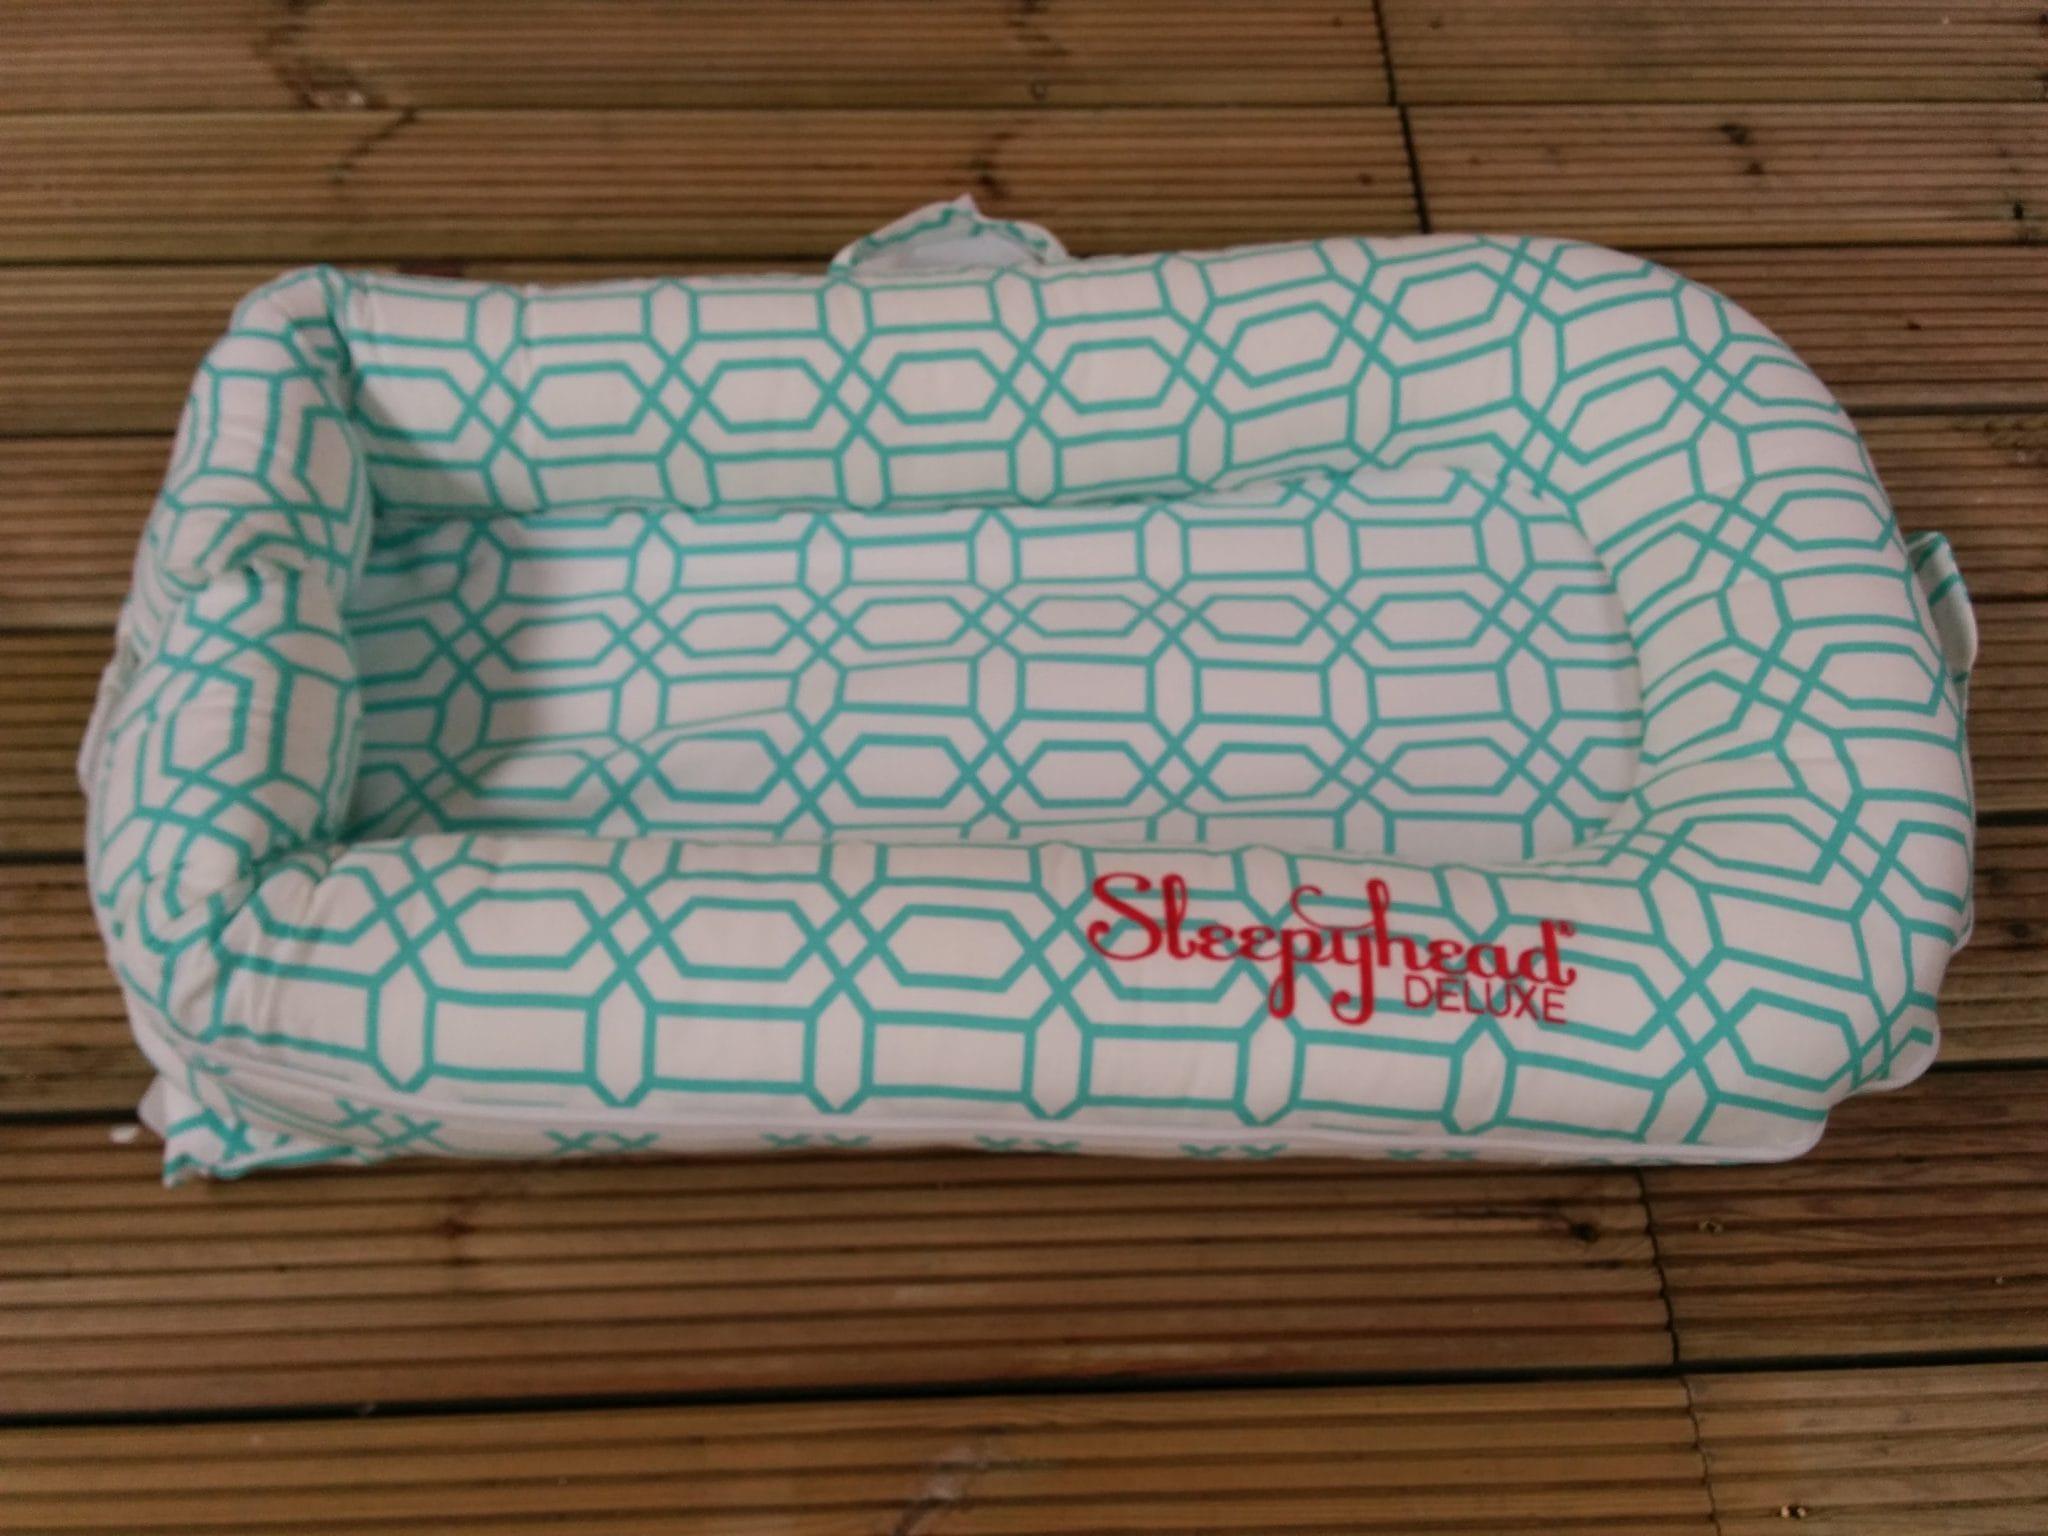 Sleepyhead Deluxe Baby Pod - The Perfect Baby Shower Gift!